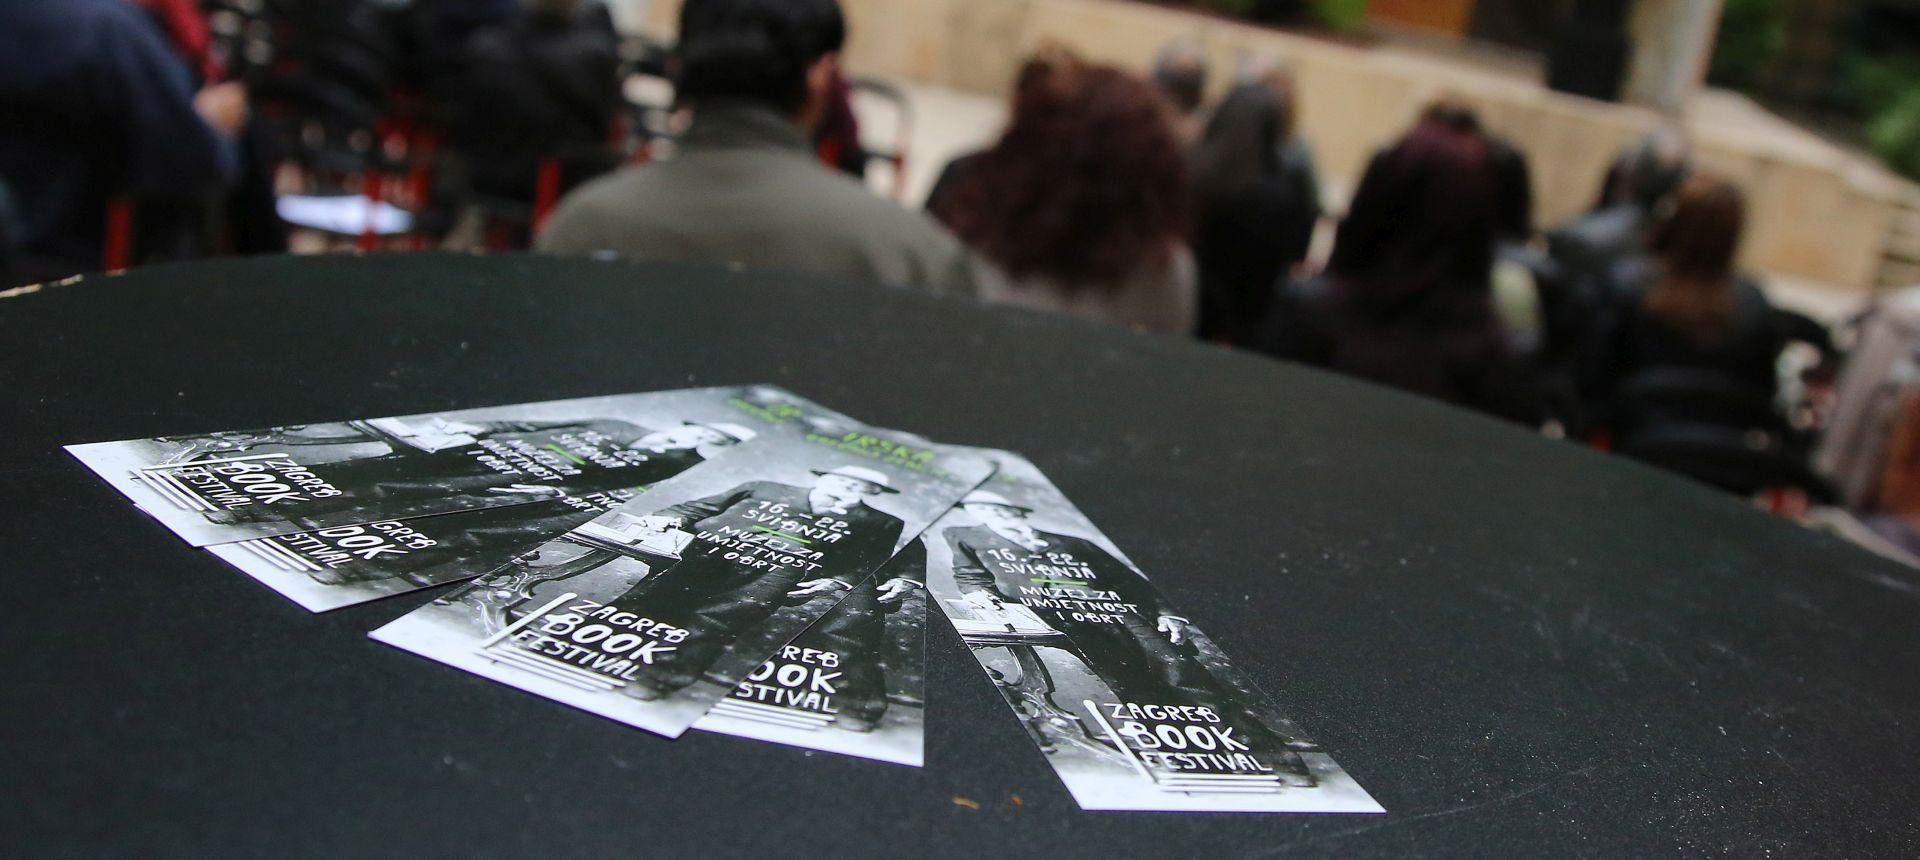 ZAGREB BOOK FESTIVAL Paulus Hochgatterer: 'Nitko nije rođen zao'